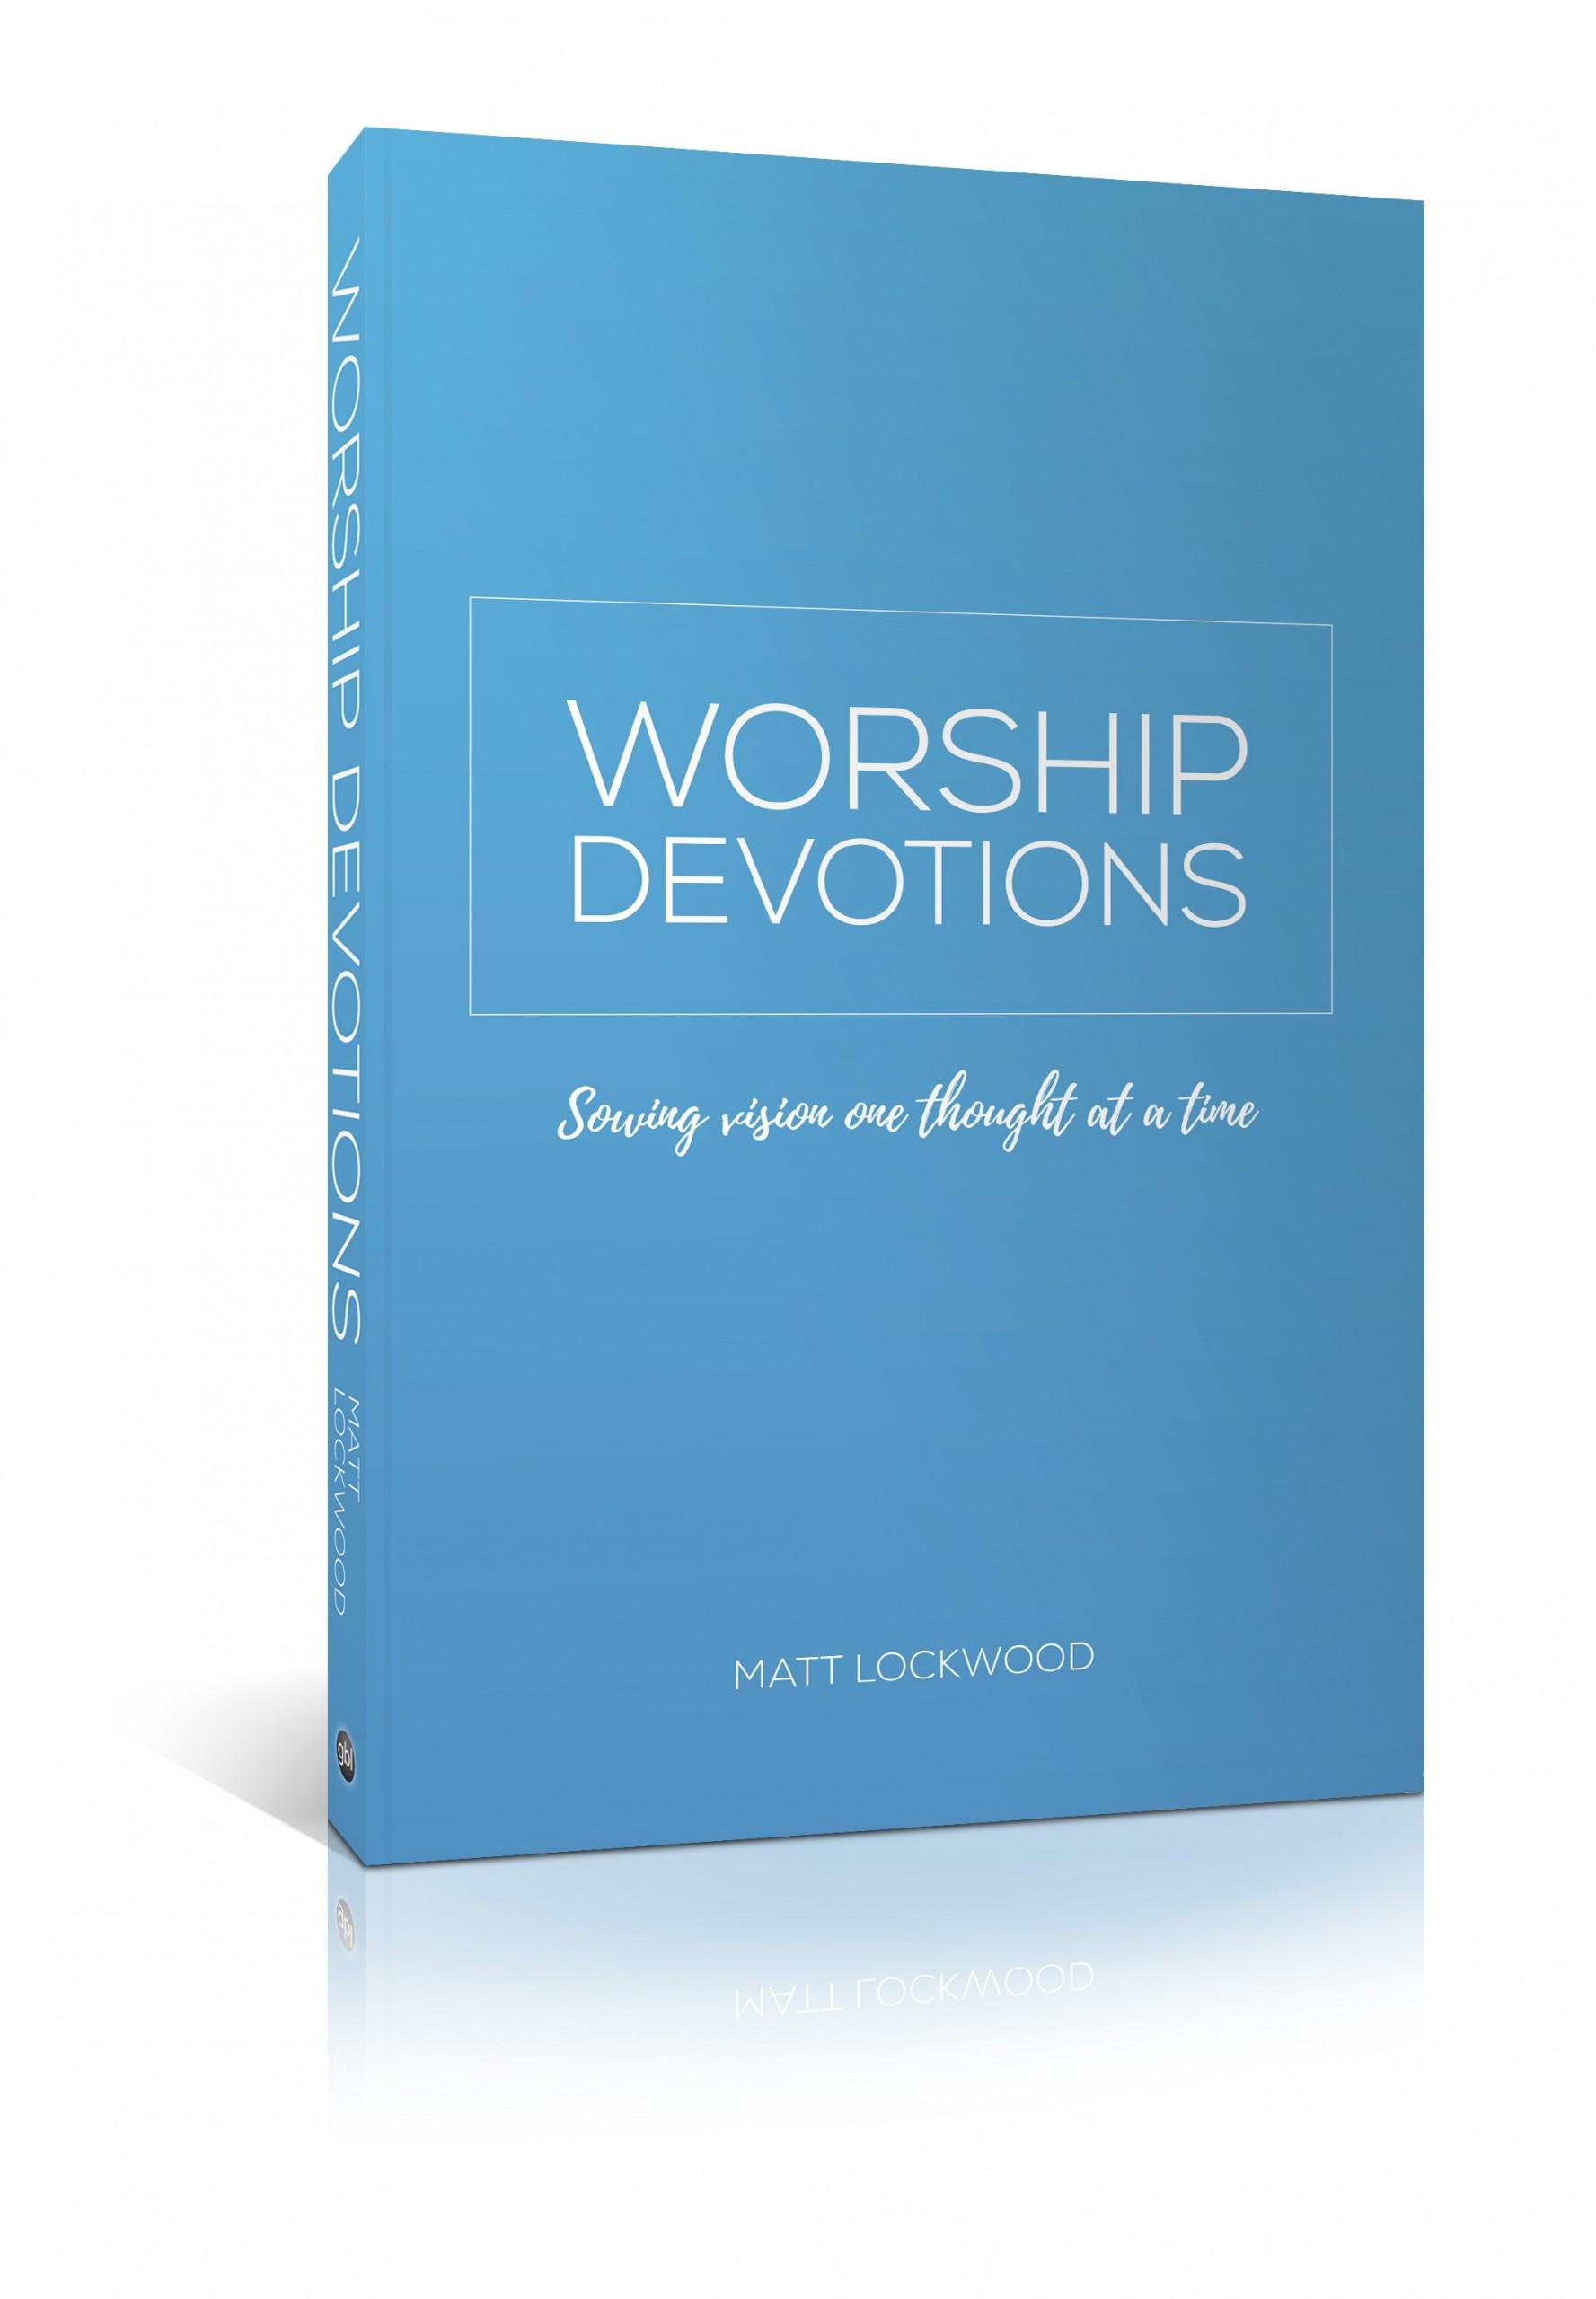 Worship Devotions